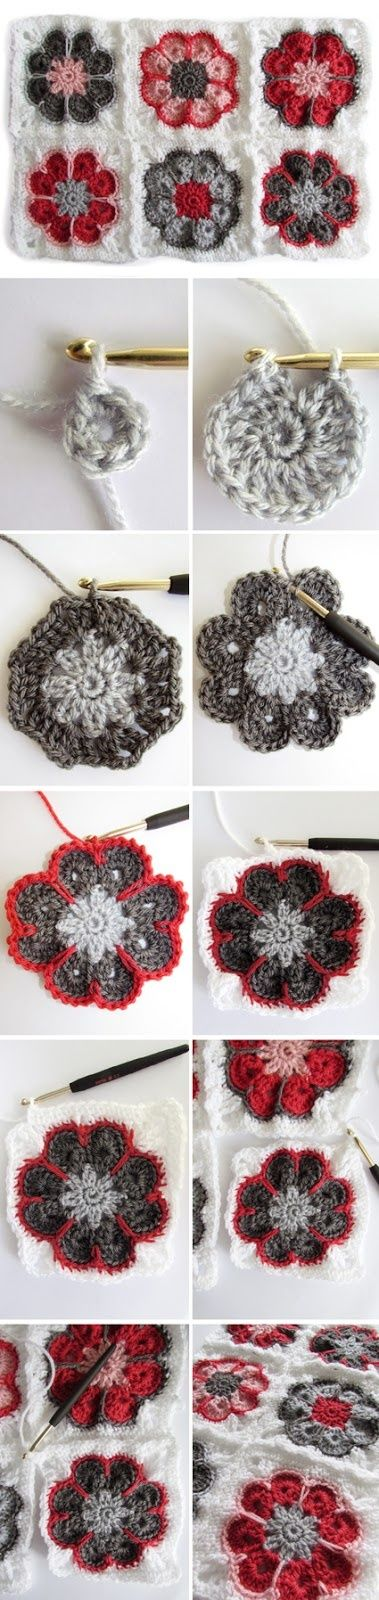 Granny Square SOMALIA tutorial | crochet | Pinterest | Häkeln ...